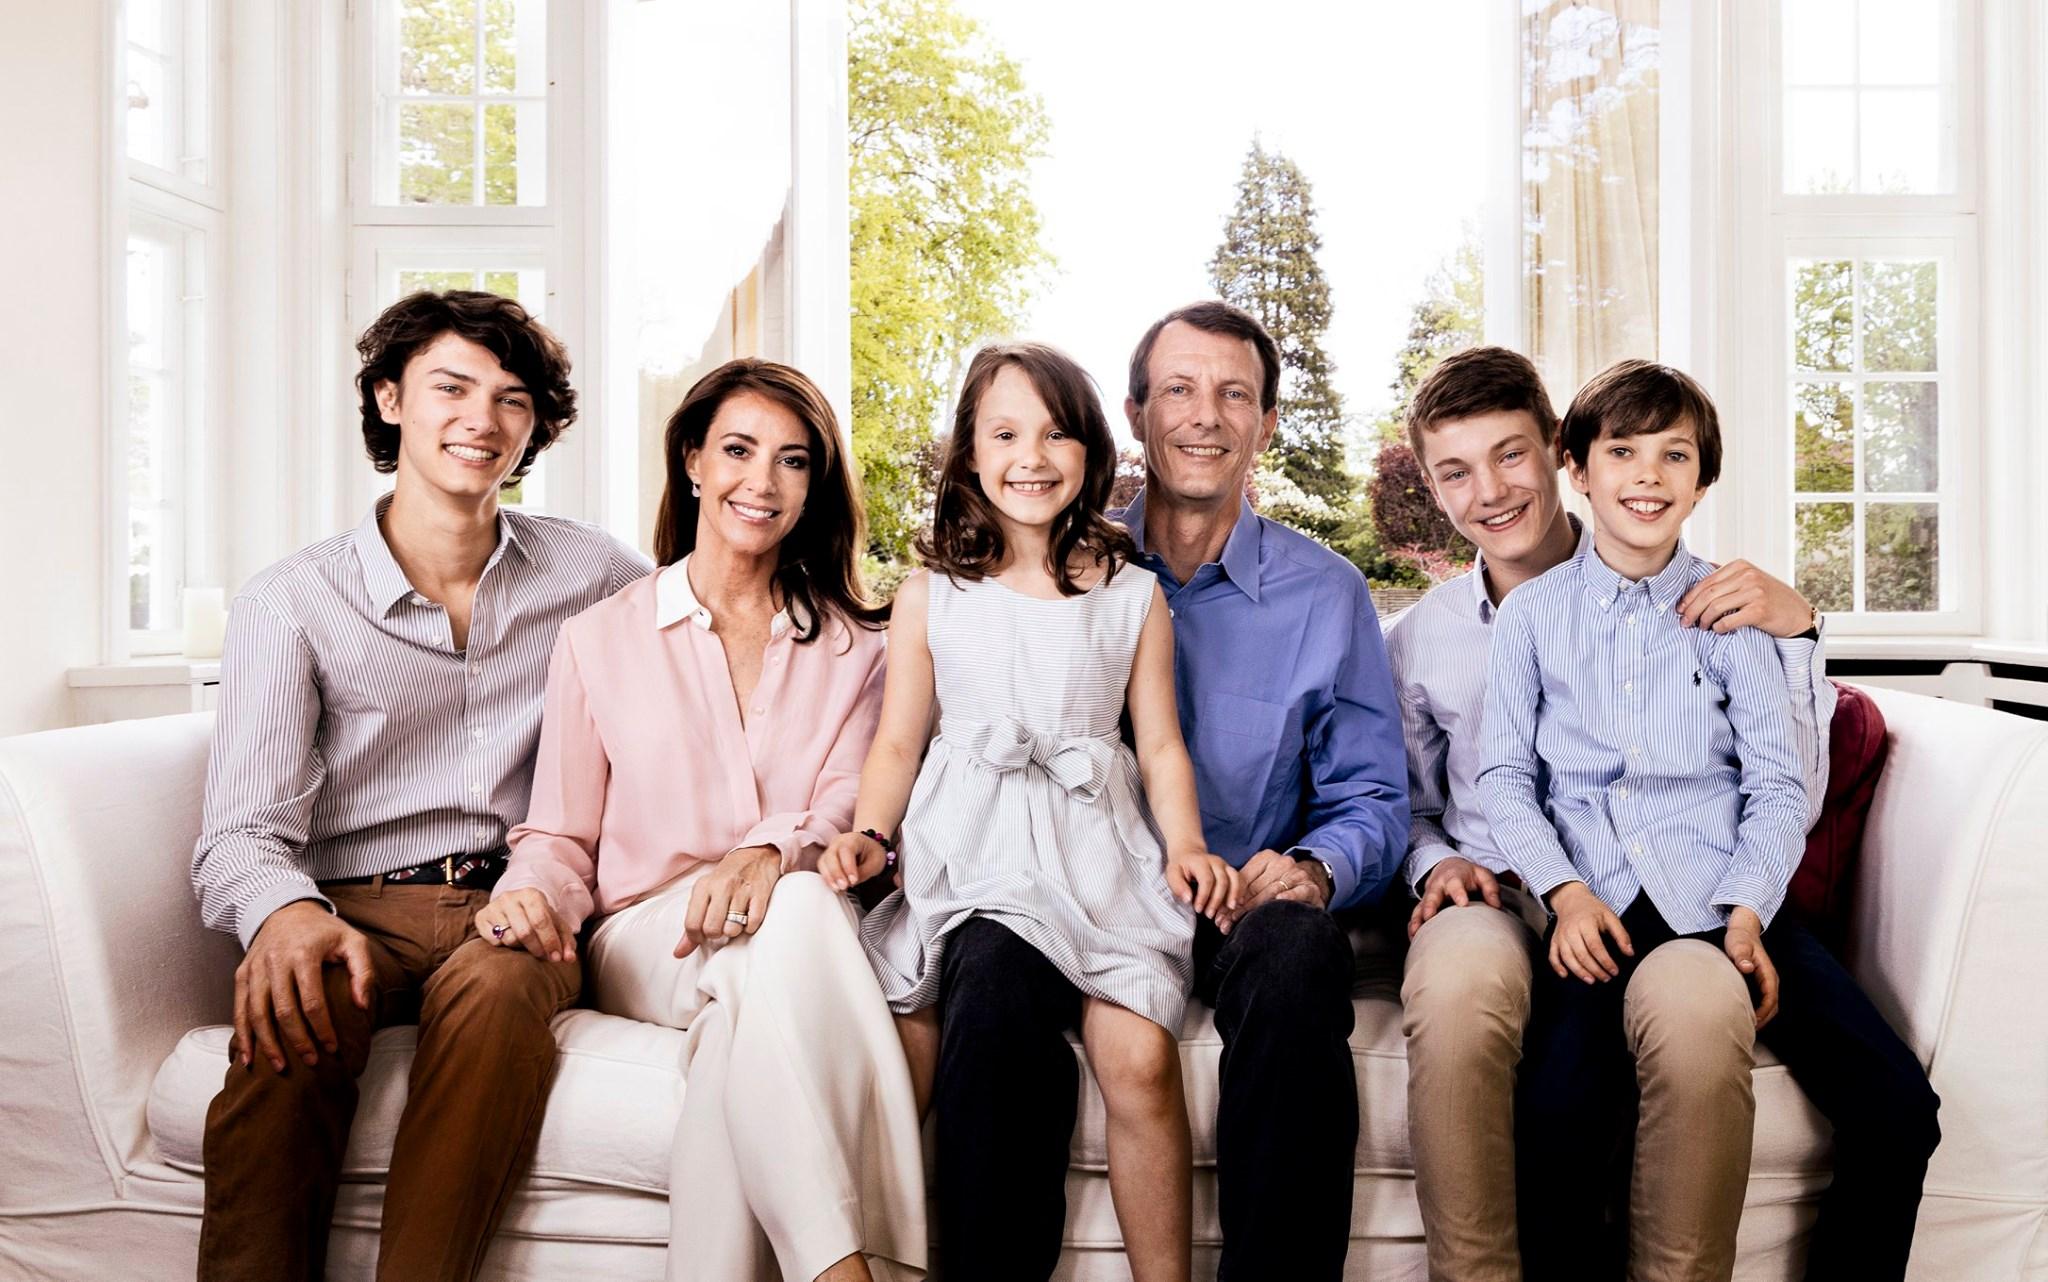 Eine glückliche Patchworkfamilie: Prinz Nikolai, Prinzessin Marie, Prinzessin Athena, Prinz Joachim, Prinz Felix und Prinz Henrik (v.l.n.r).  ©Steen Brogaard, Kongehuset.dk